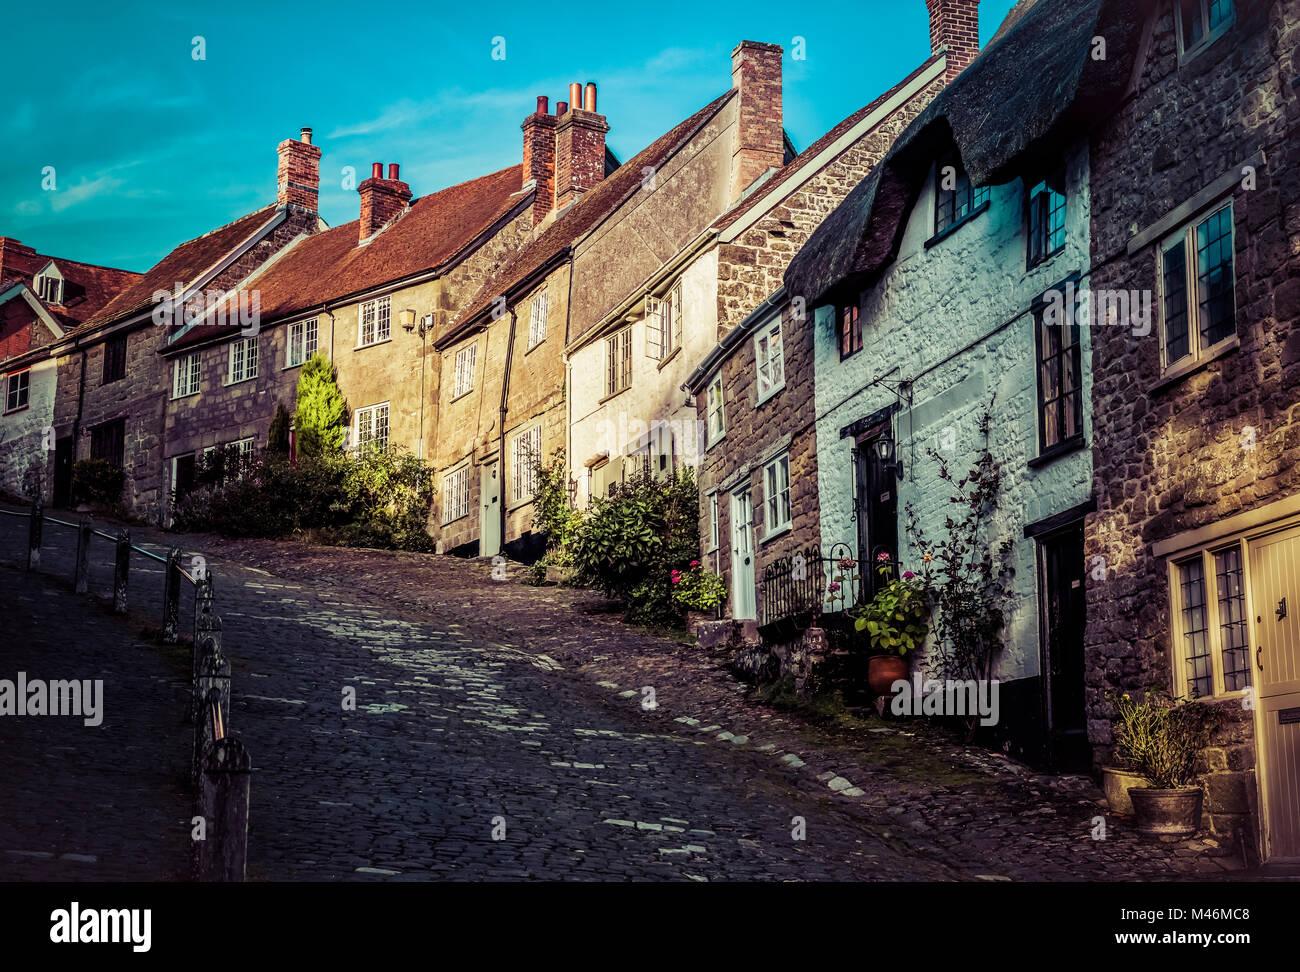 Gold Hill Shaftesbury England - Stock Image